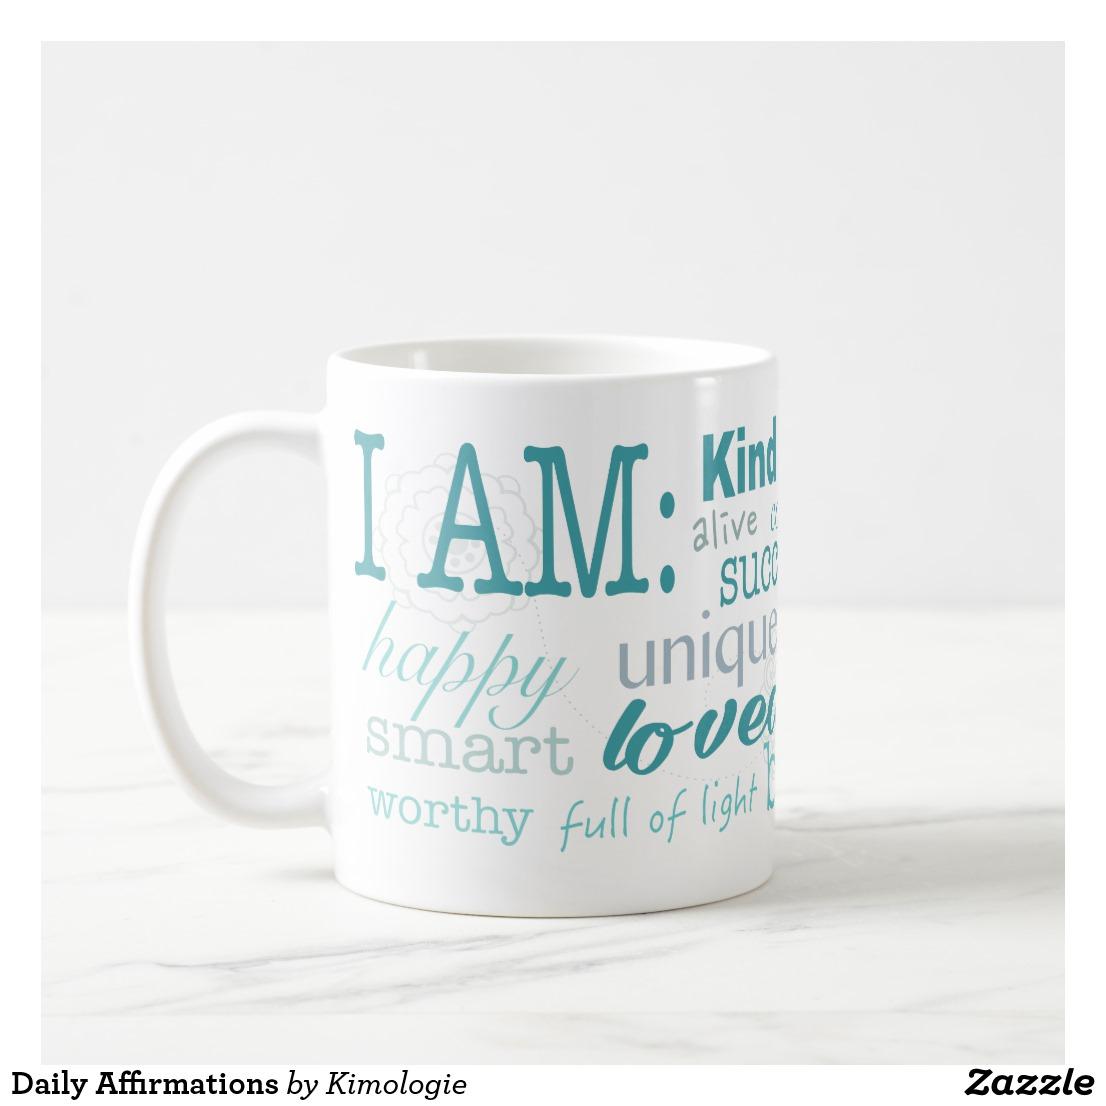 Daily Affirmations Coffee Mug Image